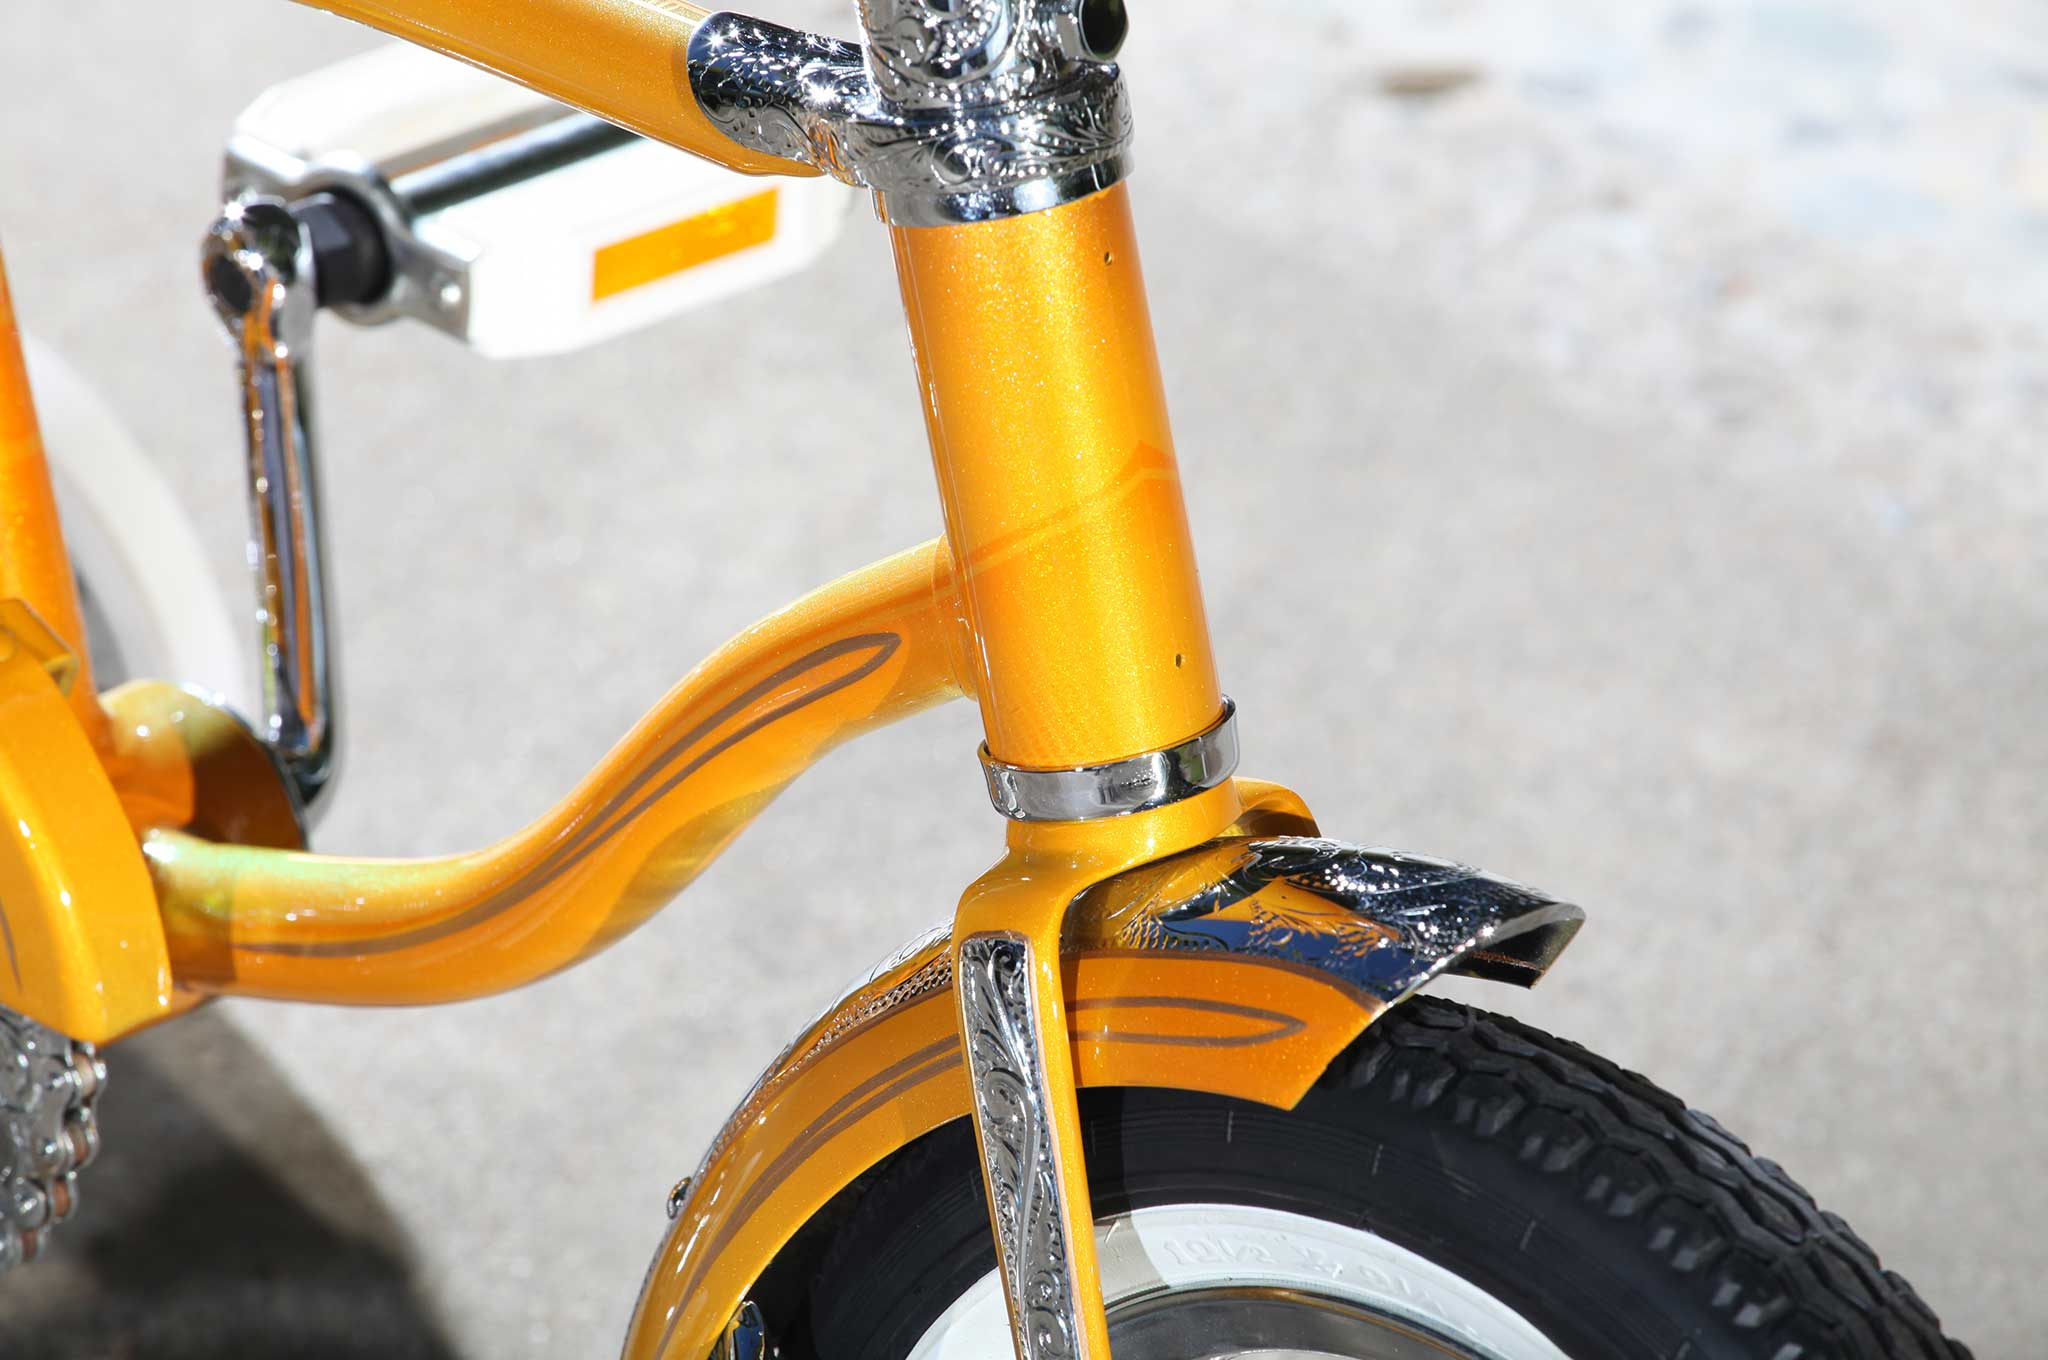 0edeec48c62 1970s Schwinn Bicycle - Lowrider